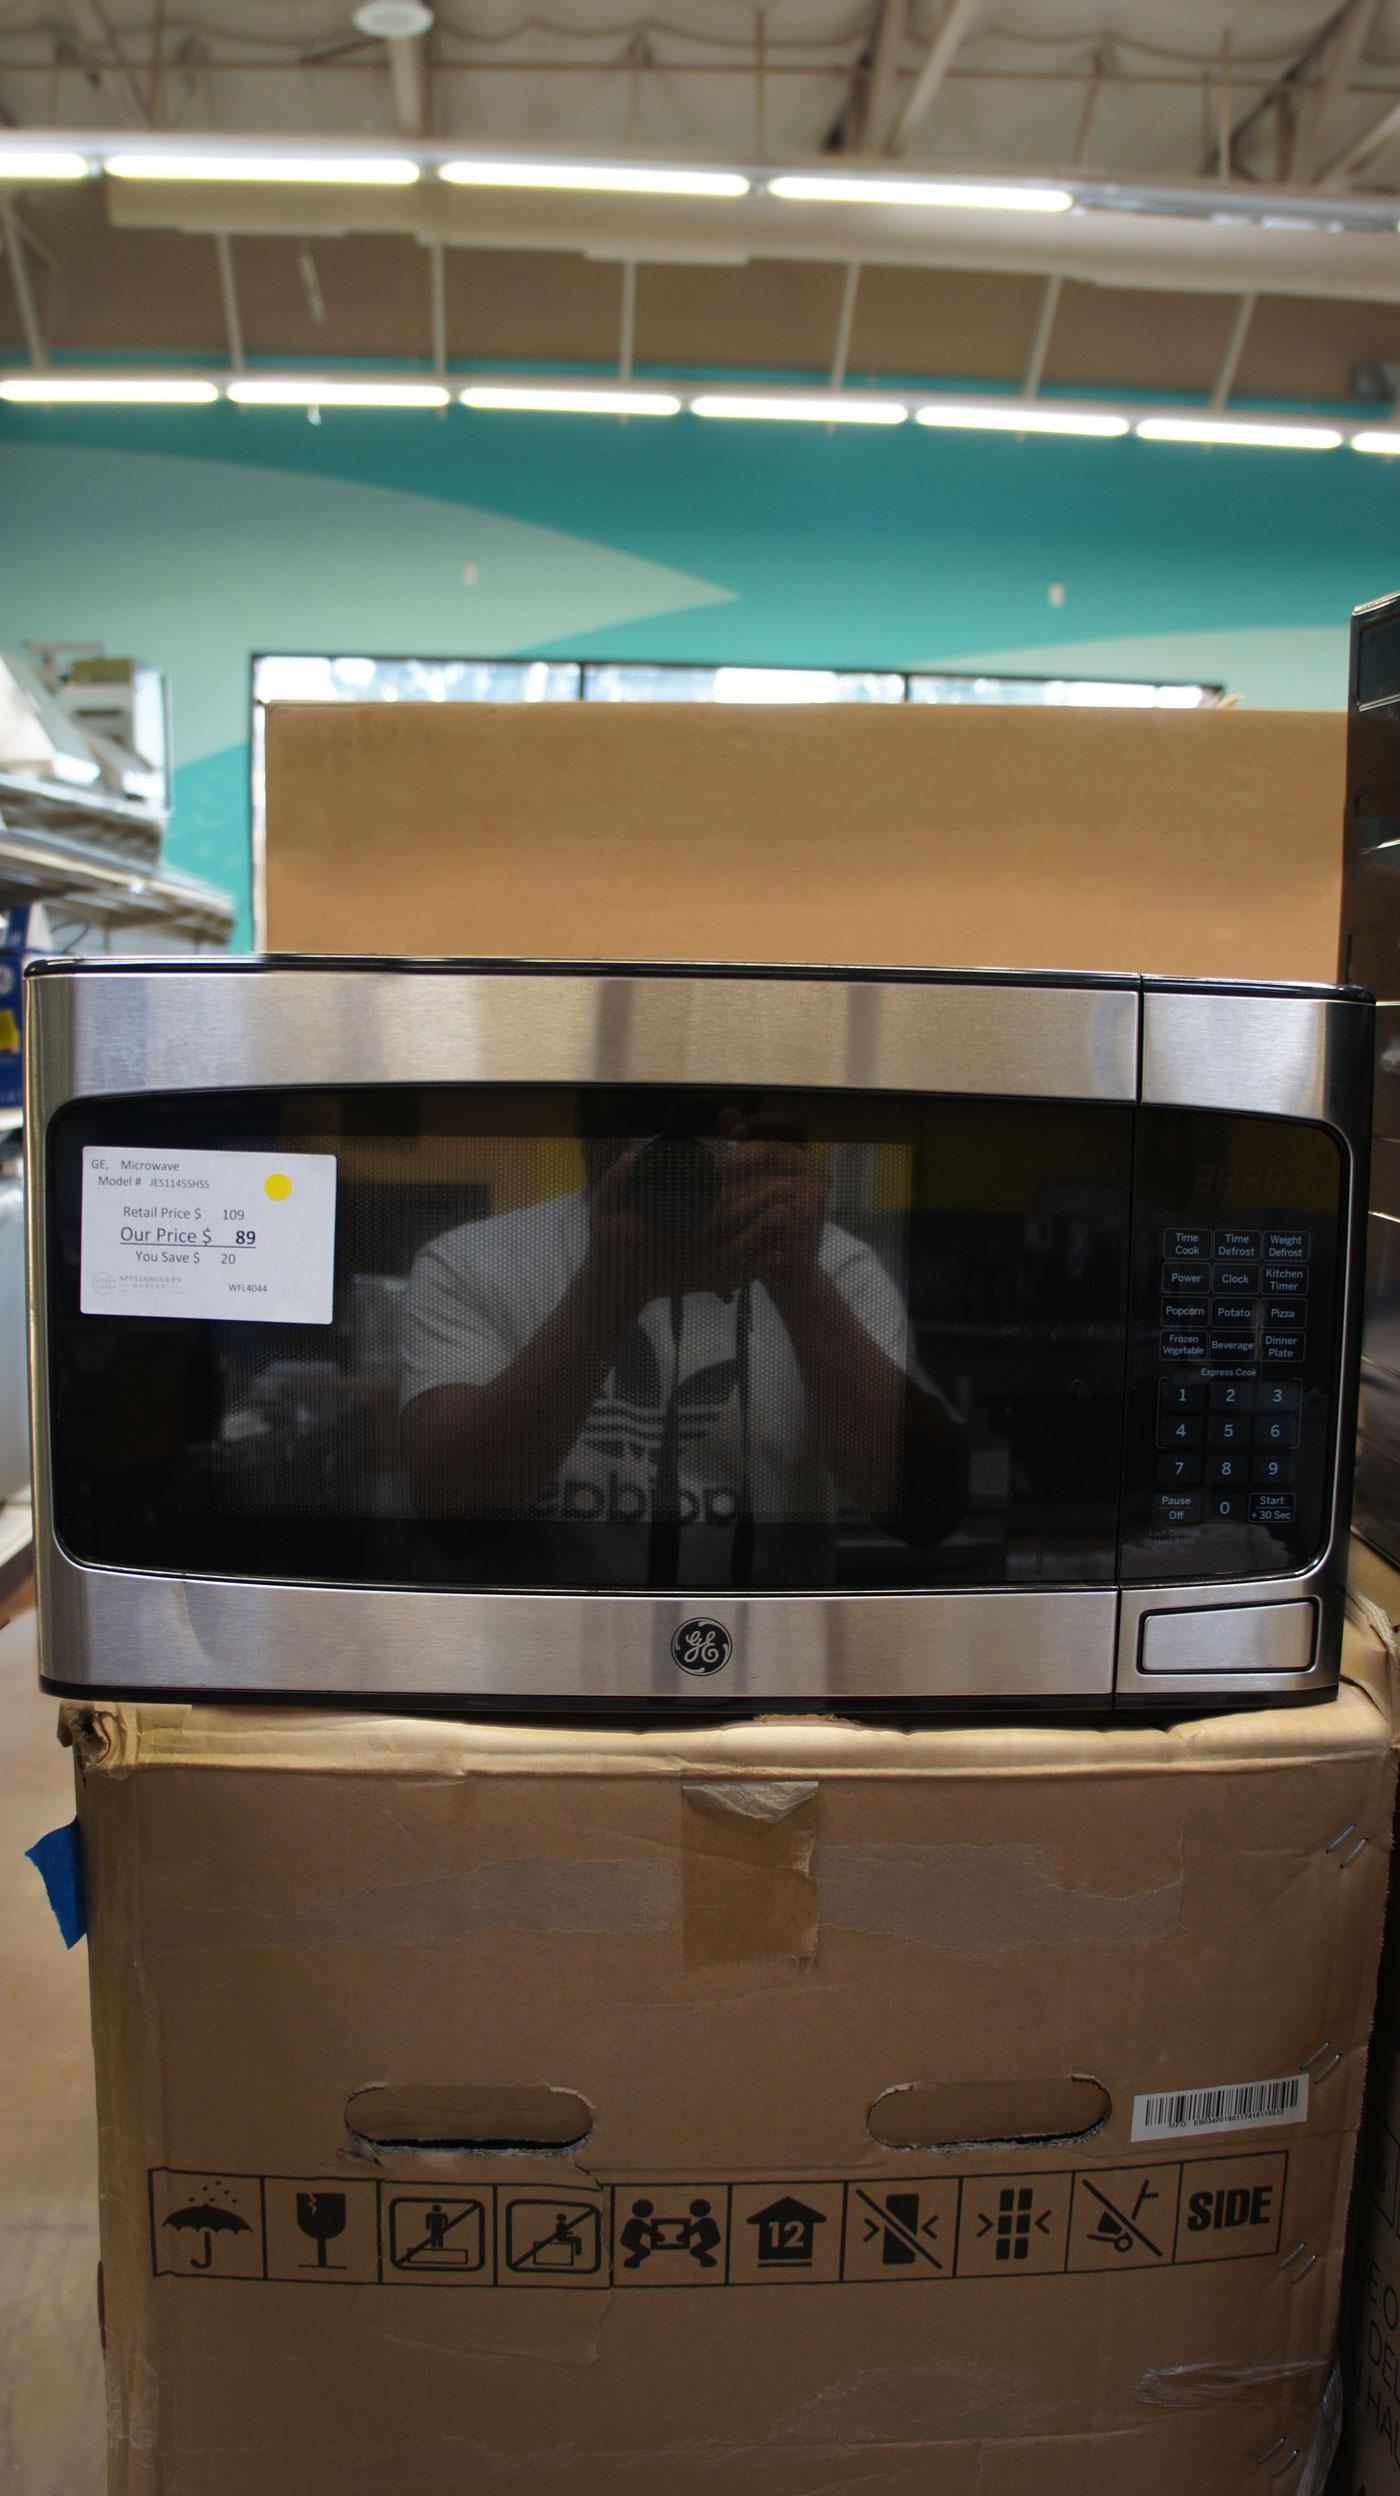 1.1 cu.ft. GE JES1145SHSS 950 Watts Countertop Microwave Oven